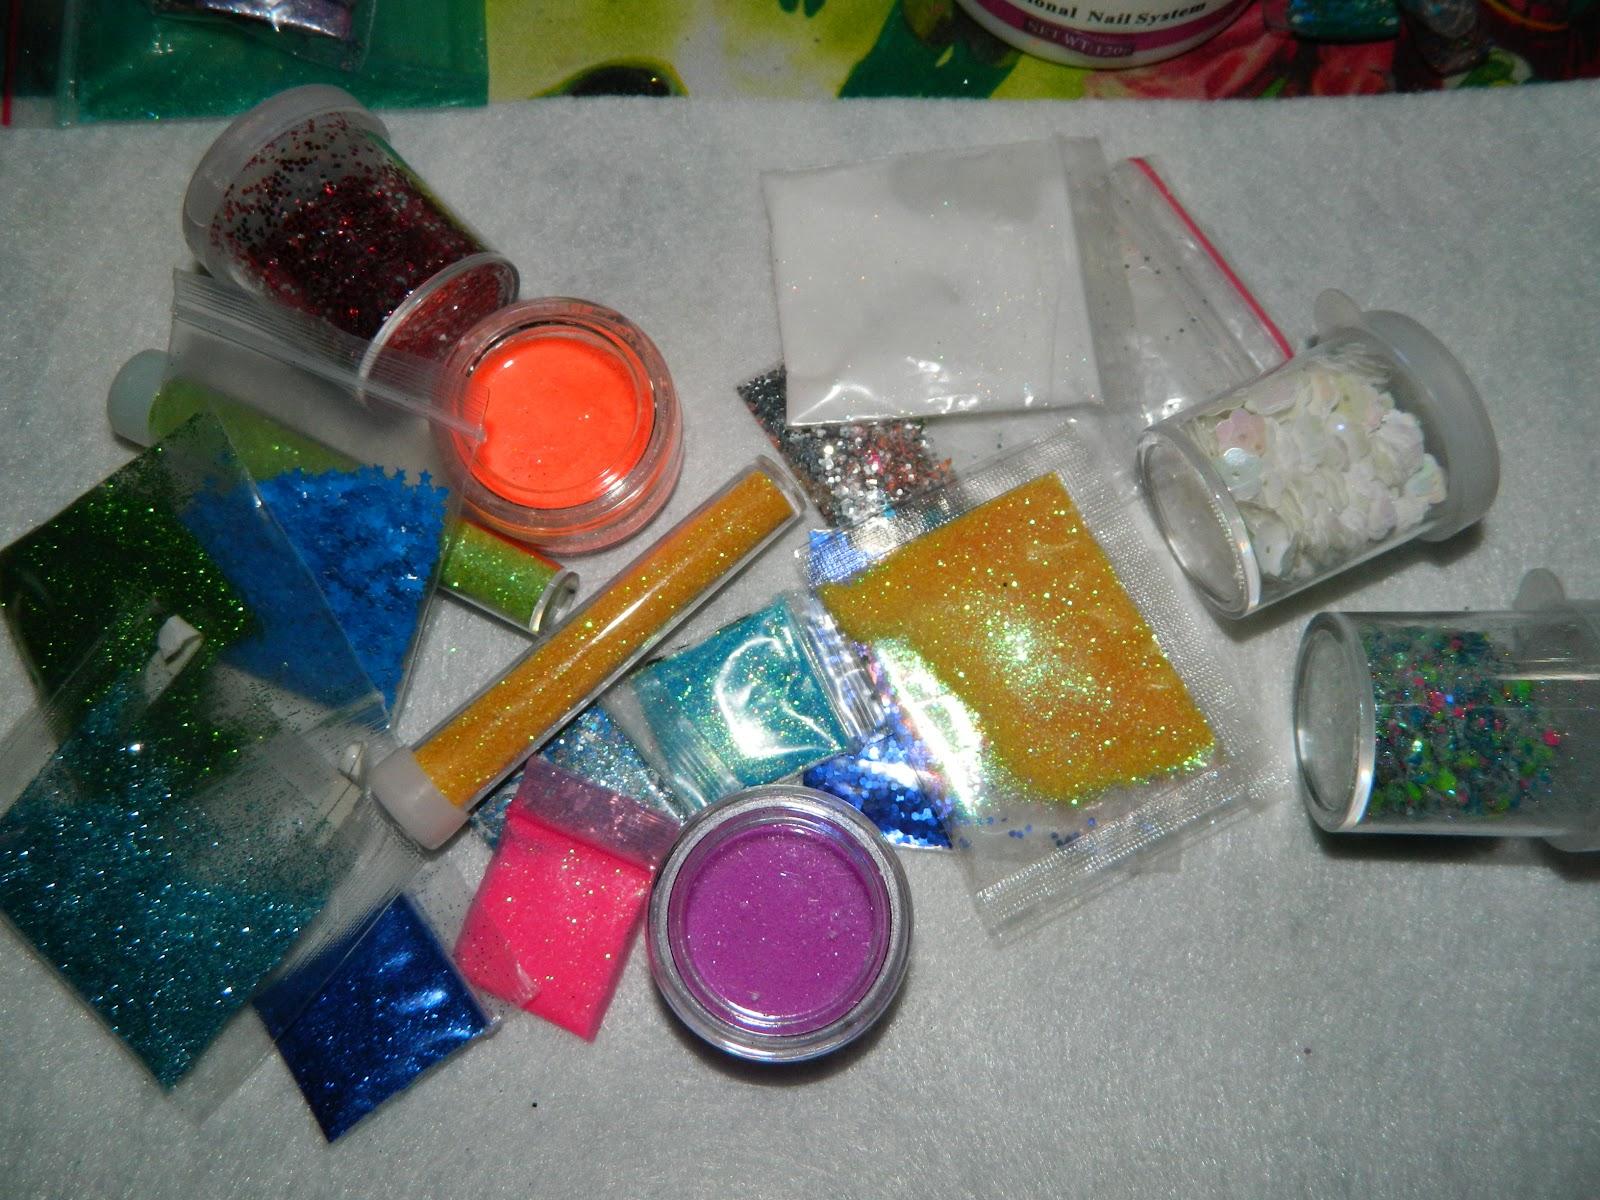 cutting edge polish : glitter and acrylic nails = # 2 use for nail ...